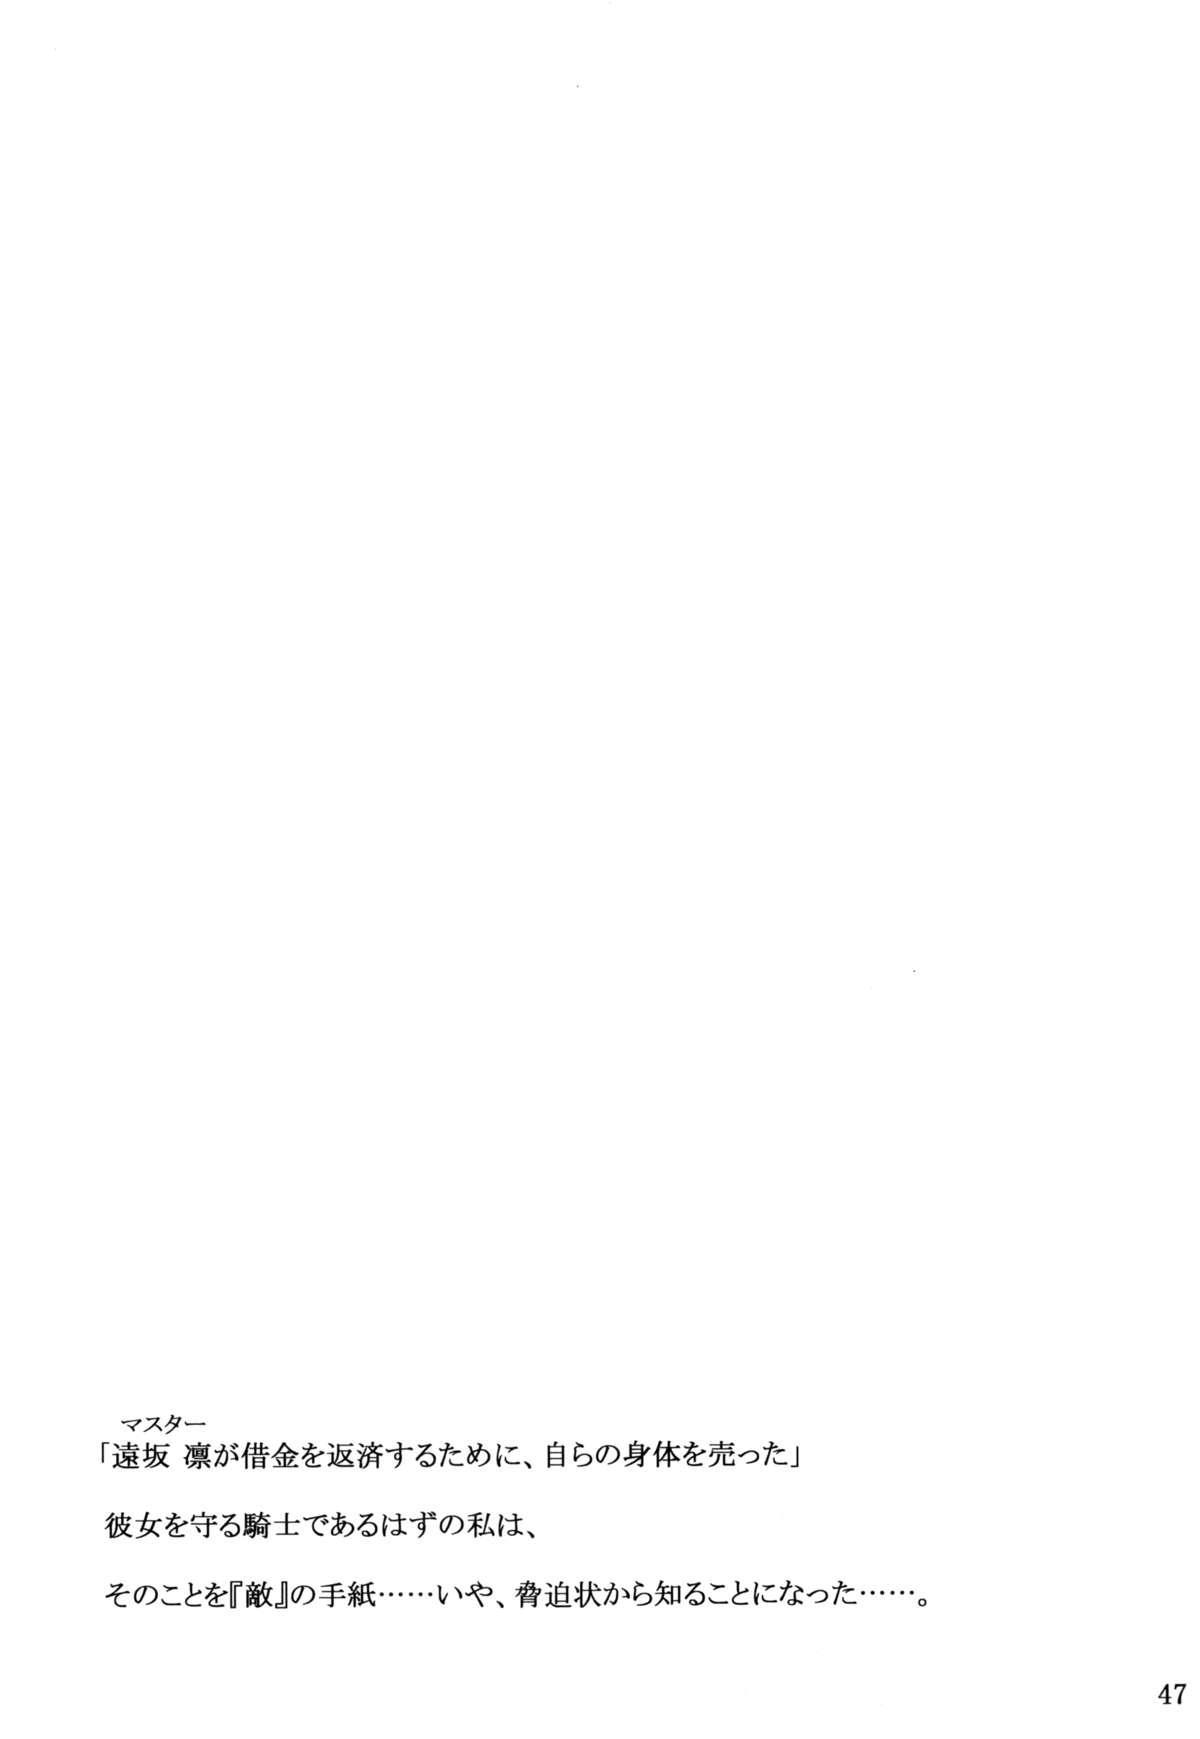 Tosaka-ke no Kakei Jijou Soushuuhen 1 46